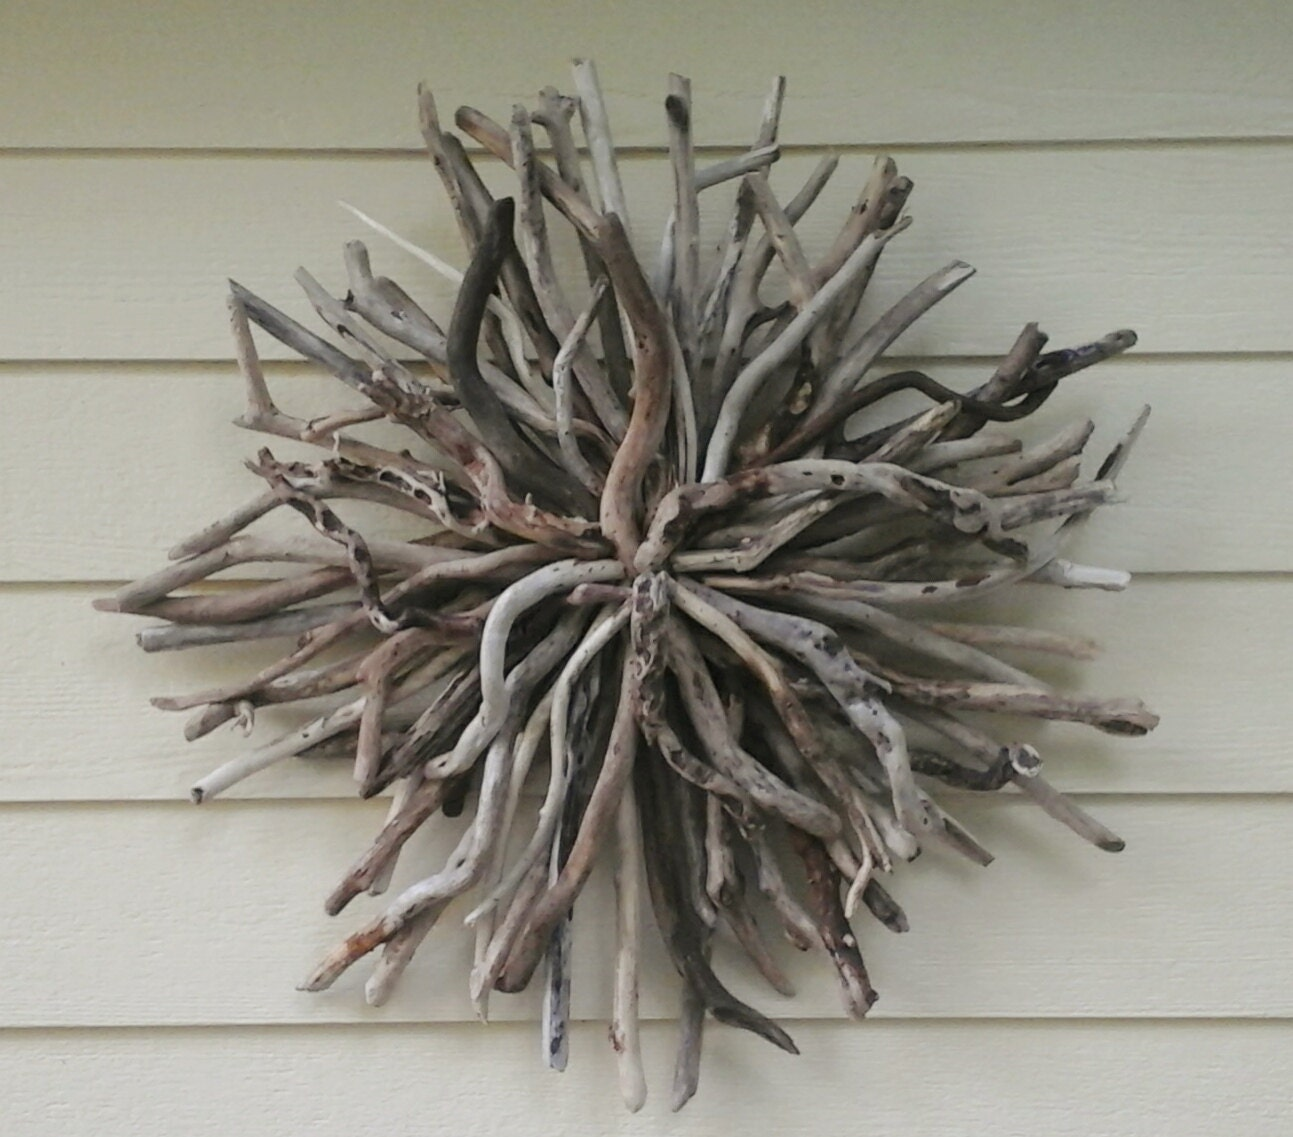 Driftwood sunburst outdoor rustic wall sculpture driftwood art for Driftwood wall